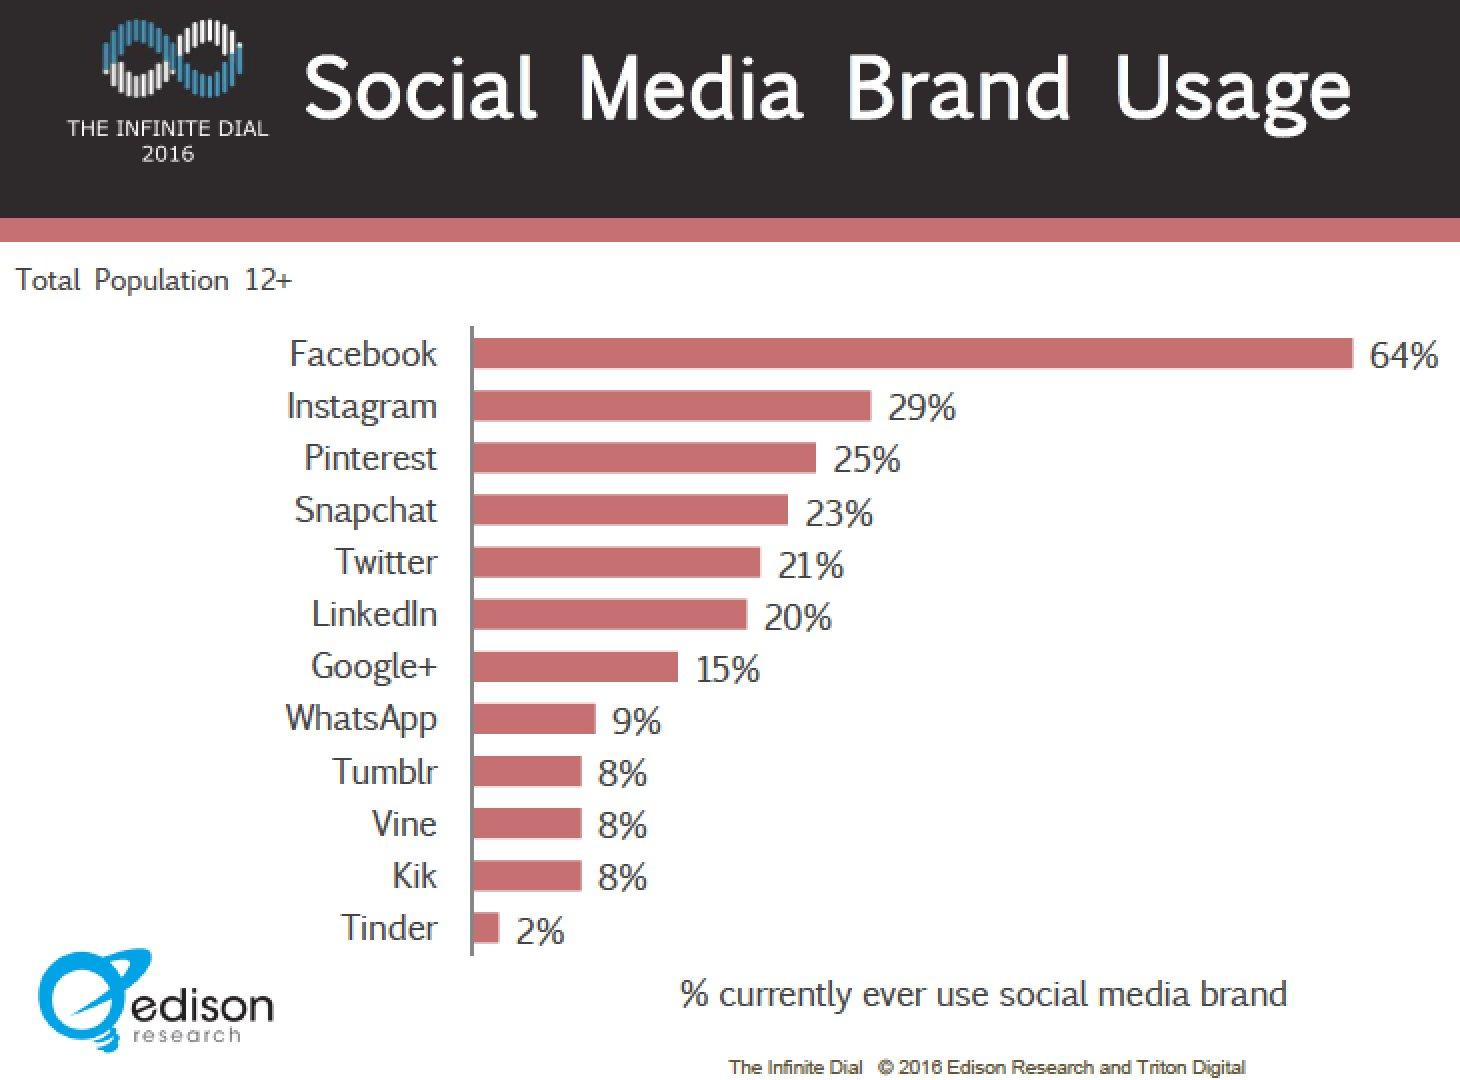 Top social media usage